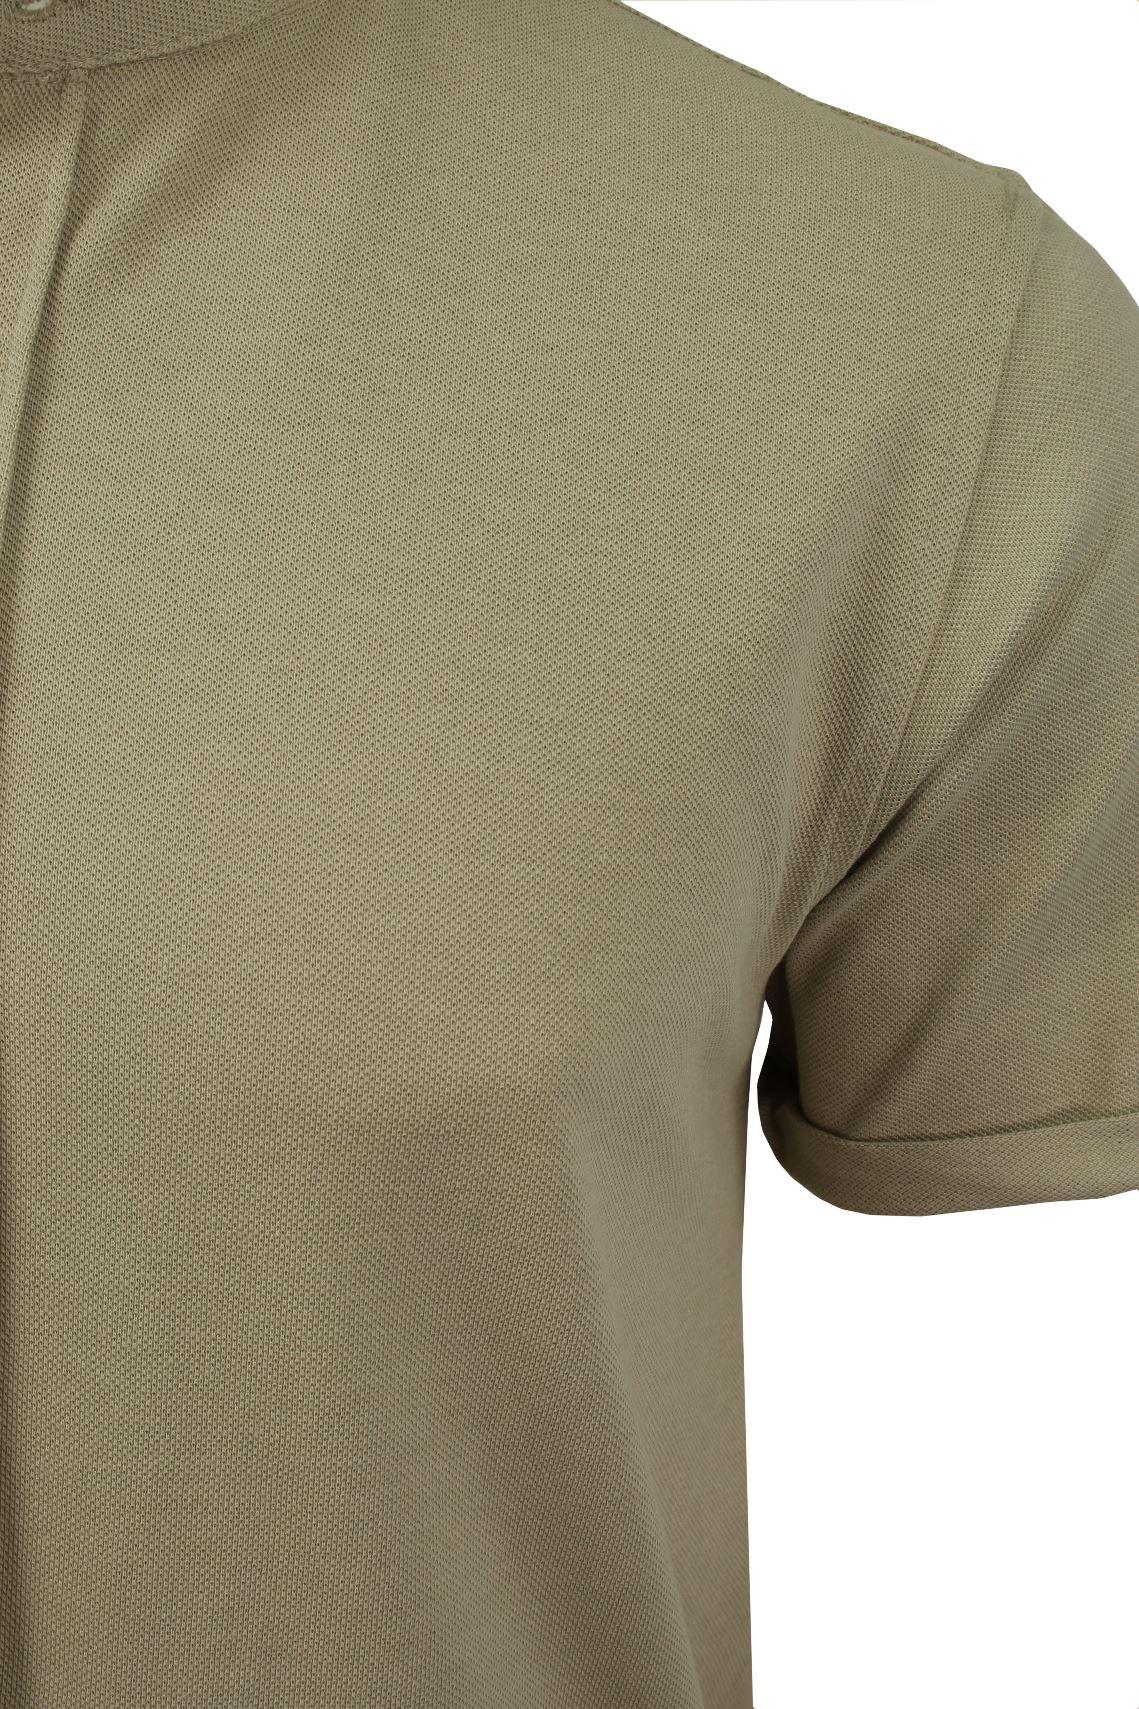 Mens-Grandad-Collar-Pique-Shirt-by-Brave-Soul-039-Joey-039 thumbnail 10